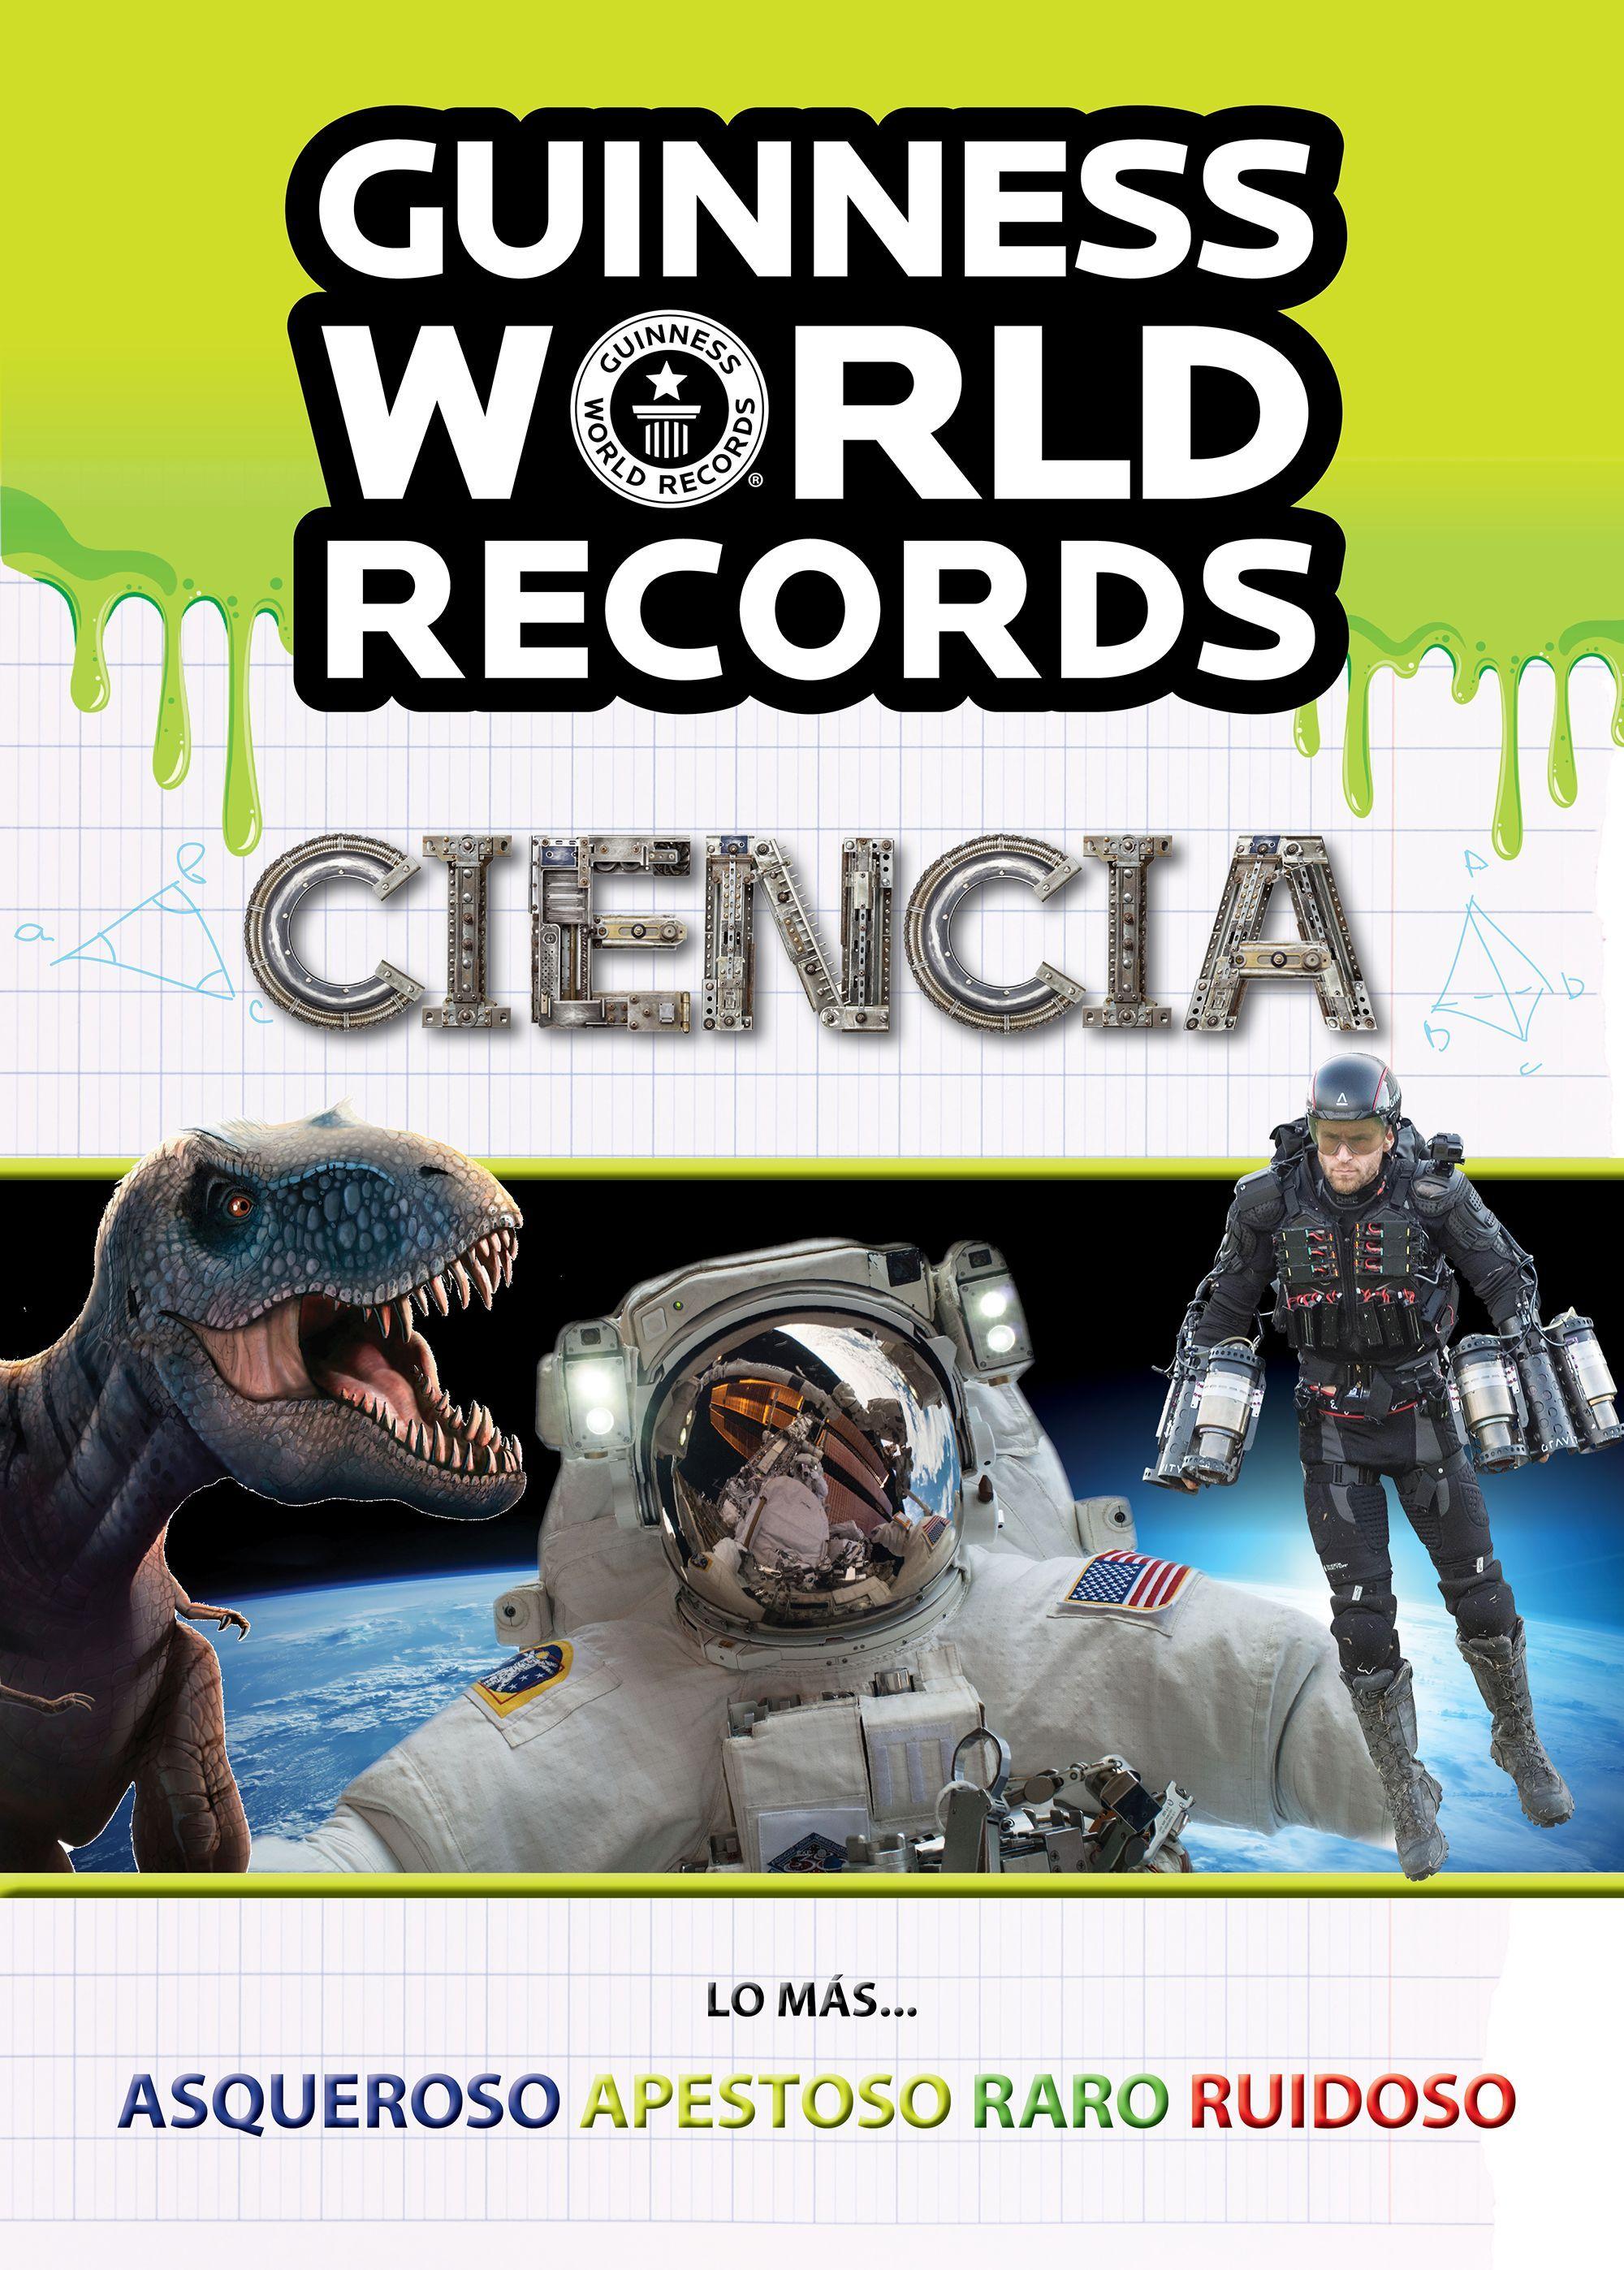 GUINNESS WORLD RECORDS. CIENCIA